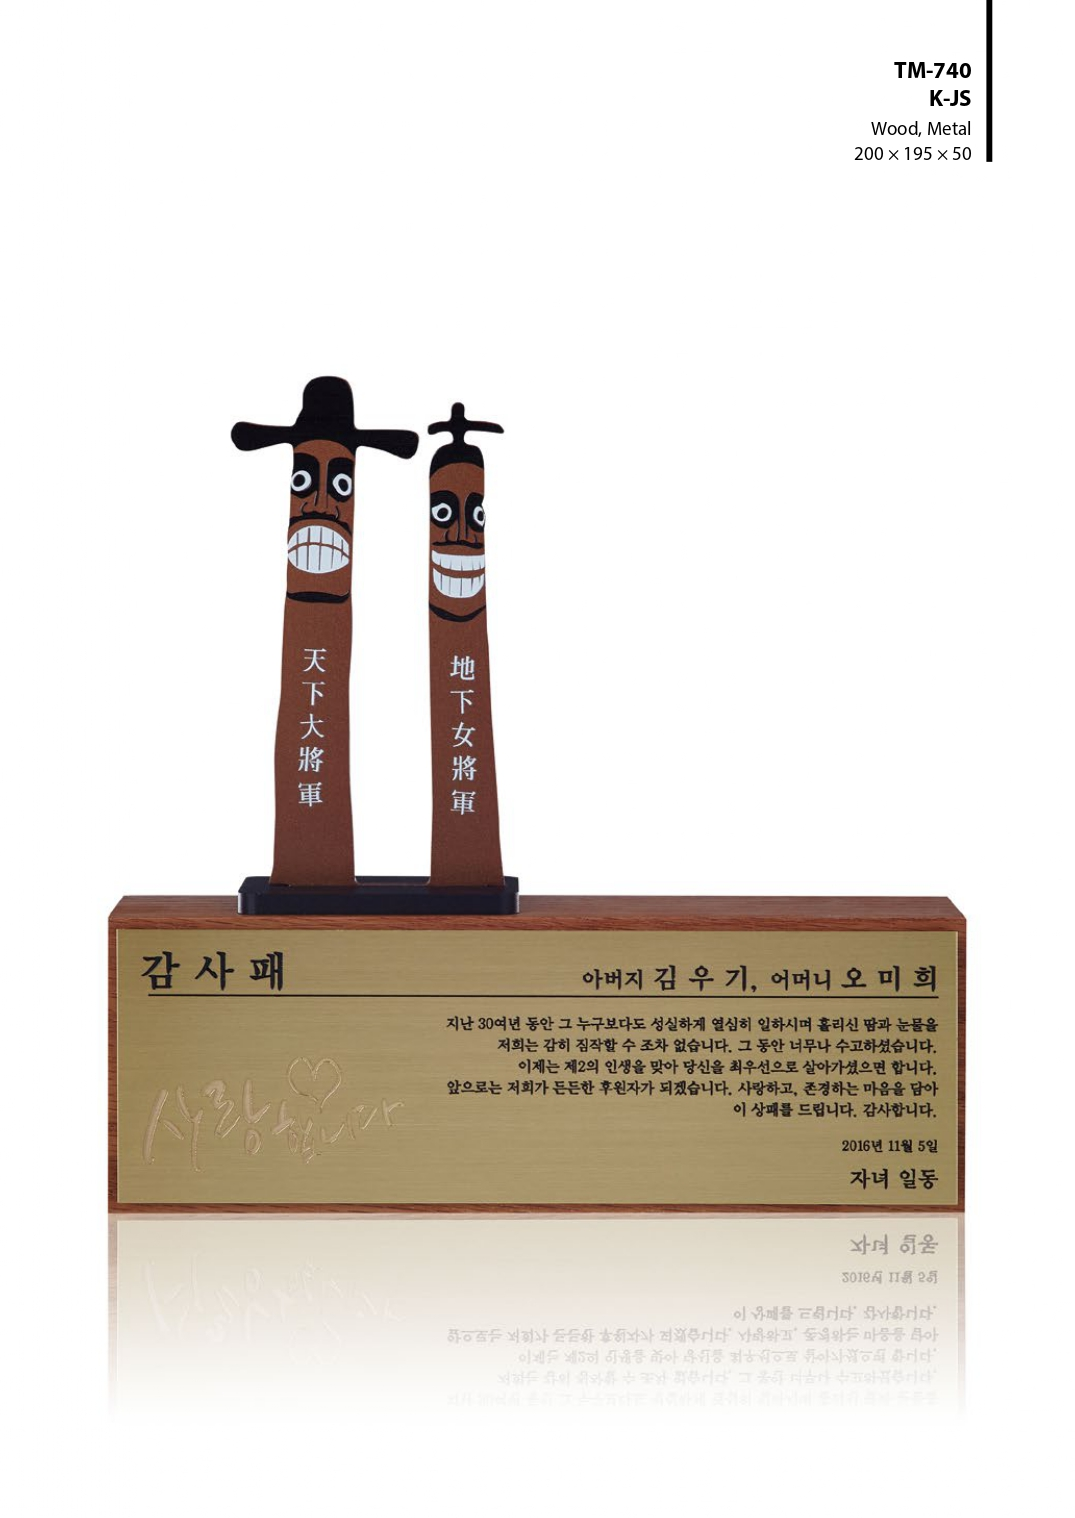 KLPK42036 환갑 칠순선물상패제작 주문제작트로피 상패 트로피 판촉물 제작 케이엘피코리아